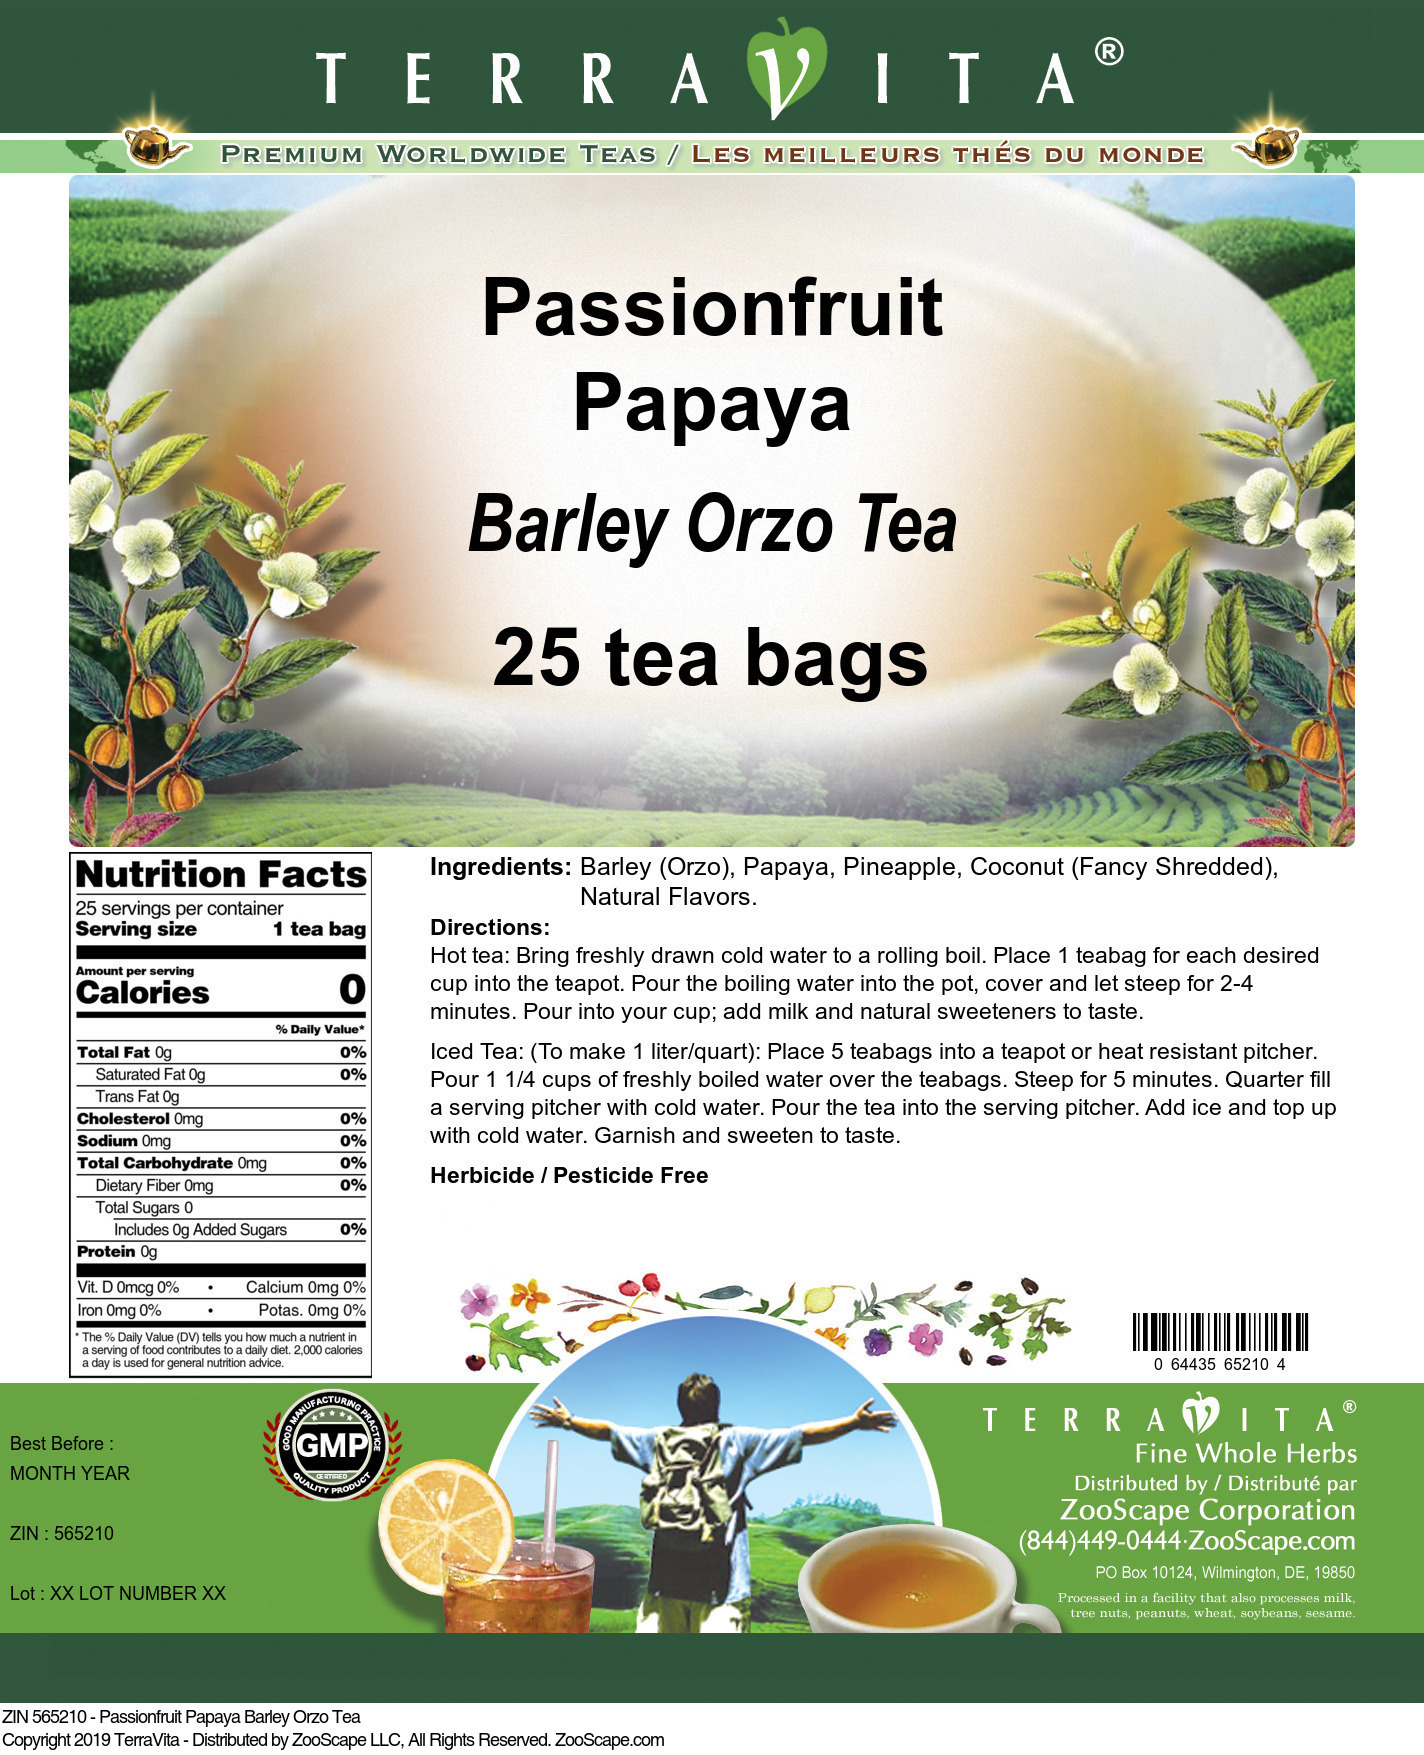 Passionfruit Papaya Barley Orzo Tea